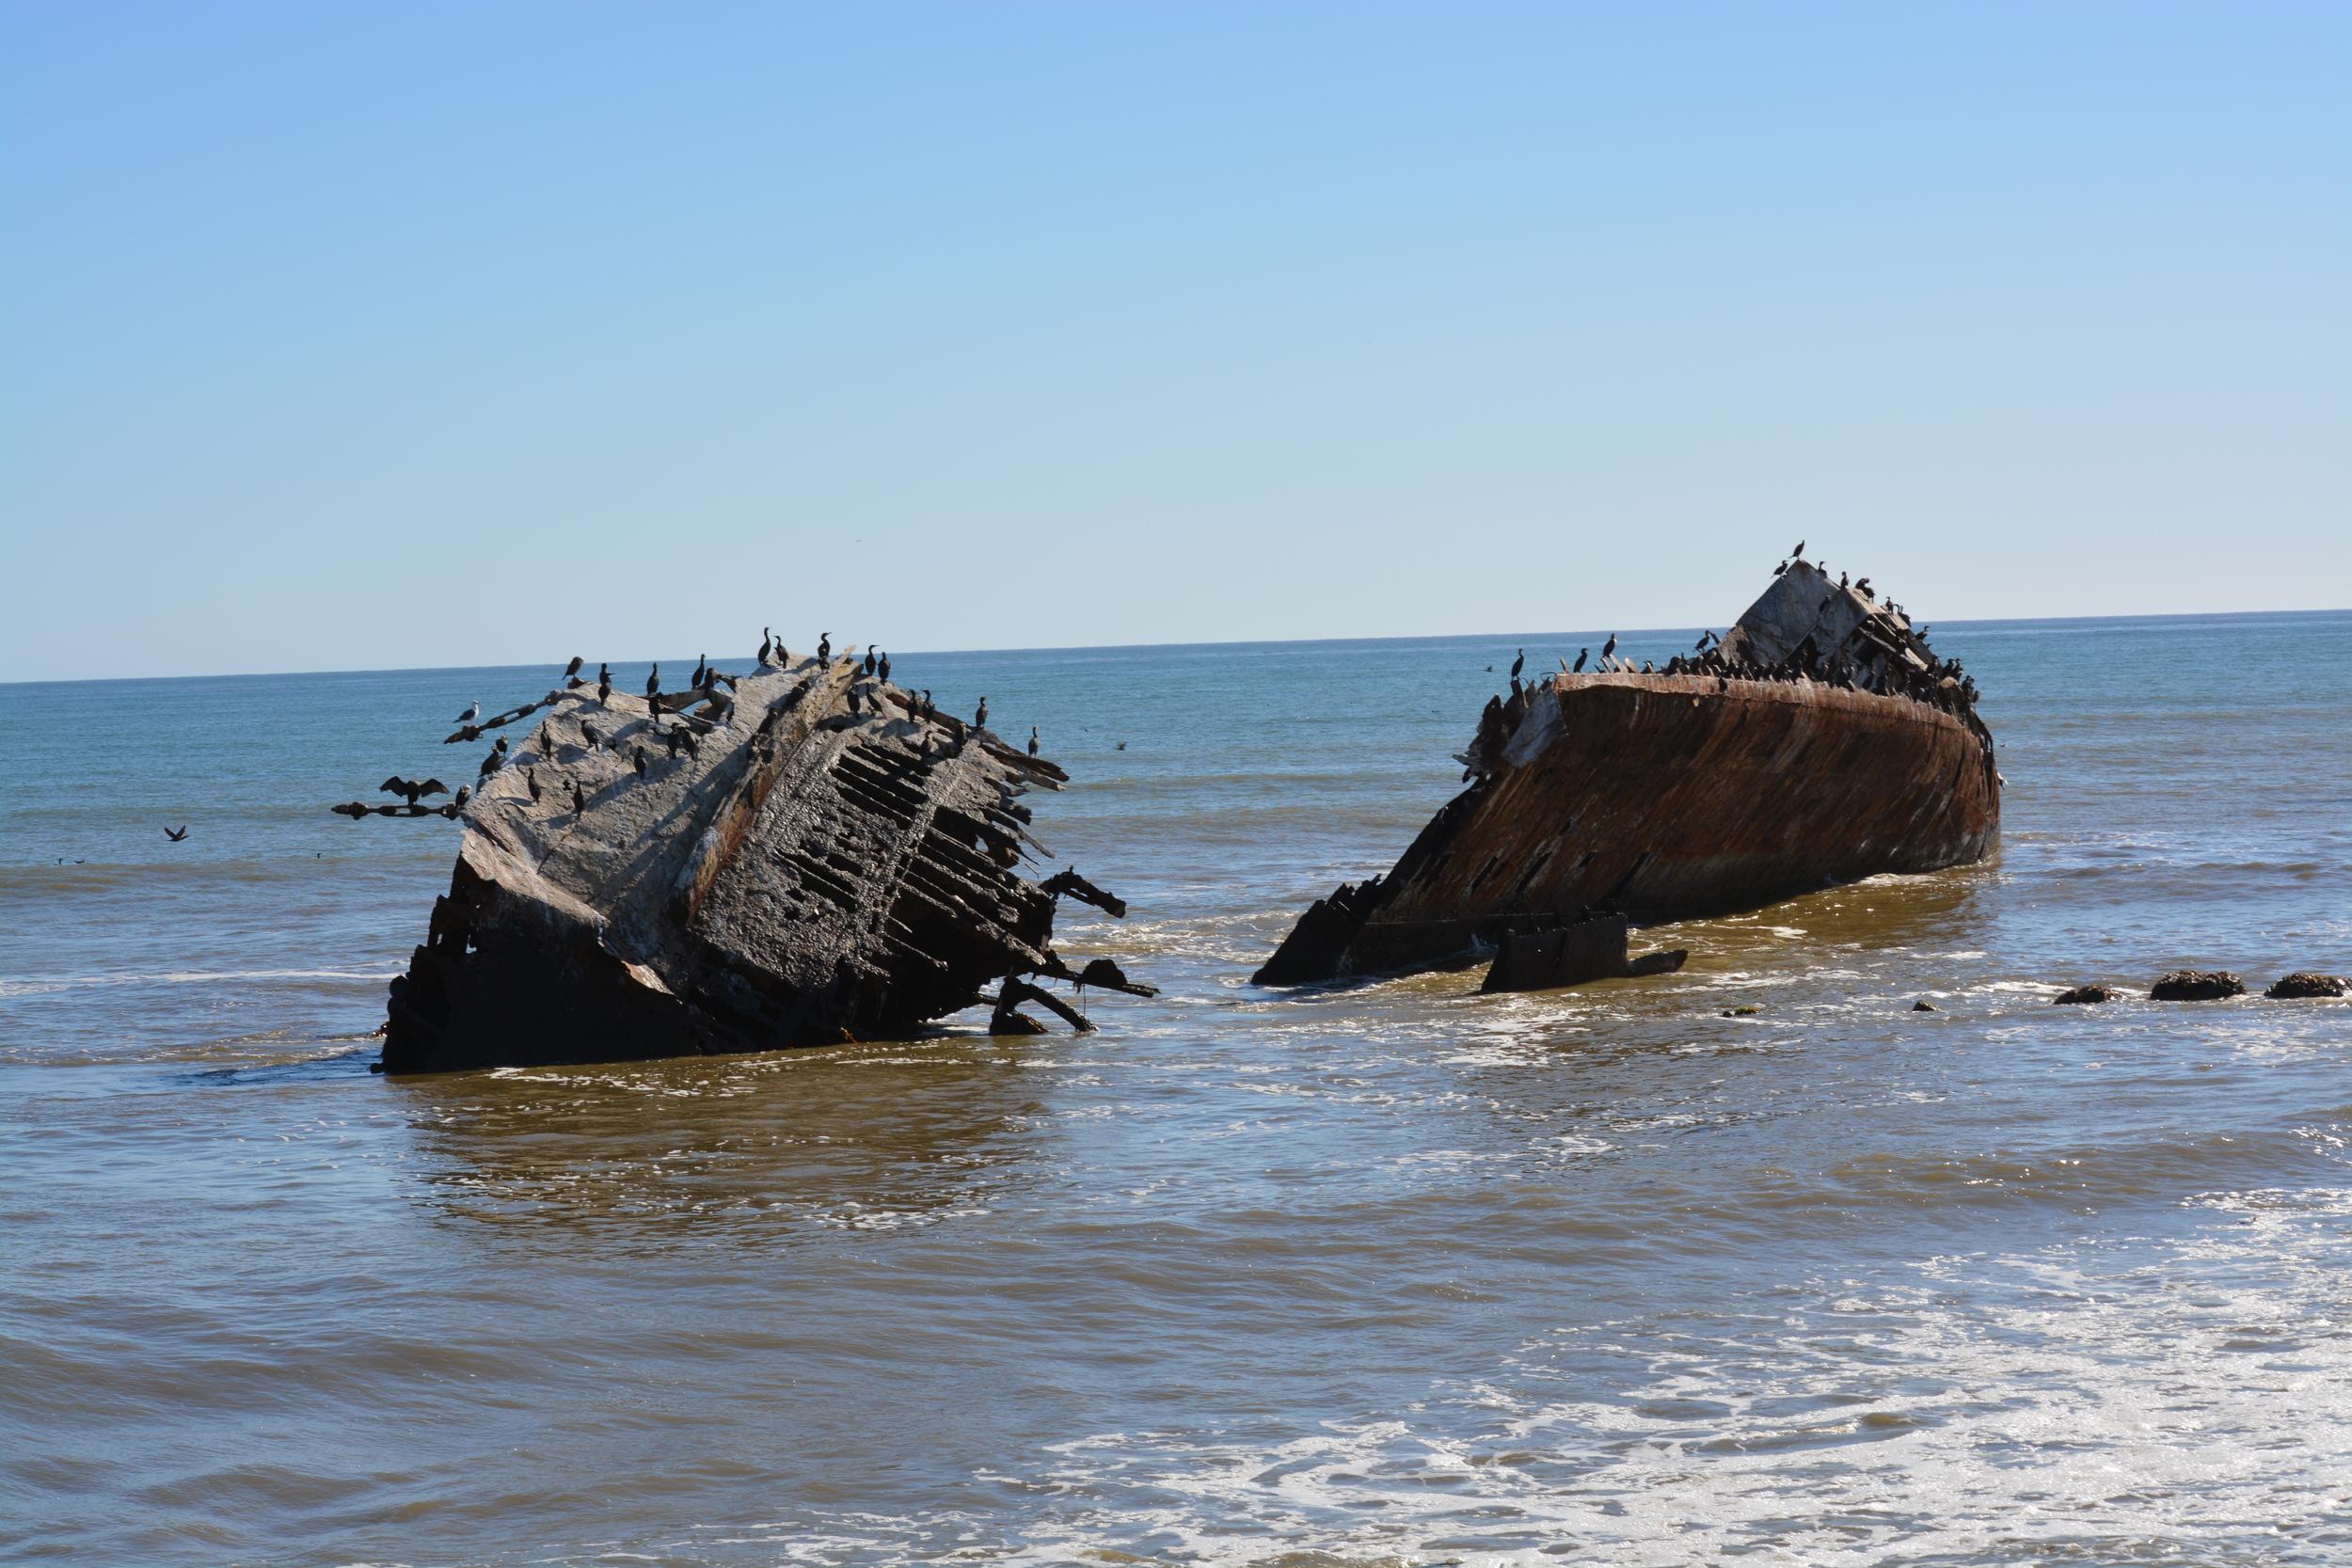 Baja California 10-5-13 Shipwrecks Surfing Adventure Ocean Experience Surf School San Diego (86).JPG